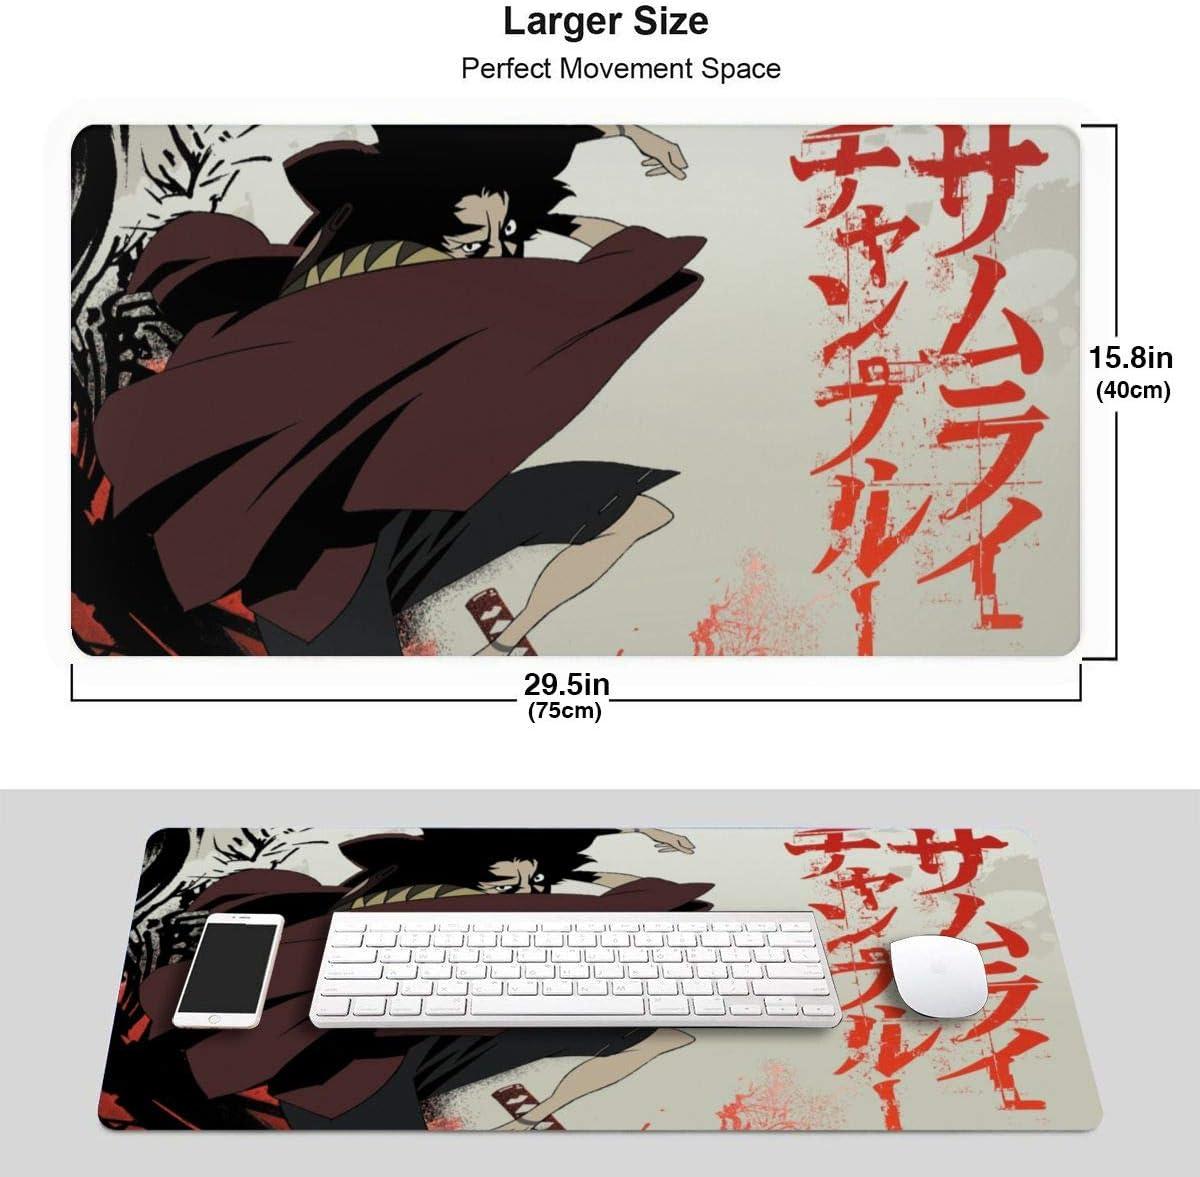 Samurai Champloo Mouse Pad 15.8x29.5 in Multipurpose Comfortable Waterproof Mousepad Desk Mat for Gamer Office Home 40x75cm